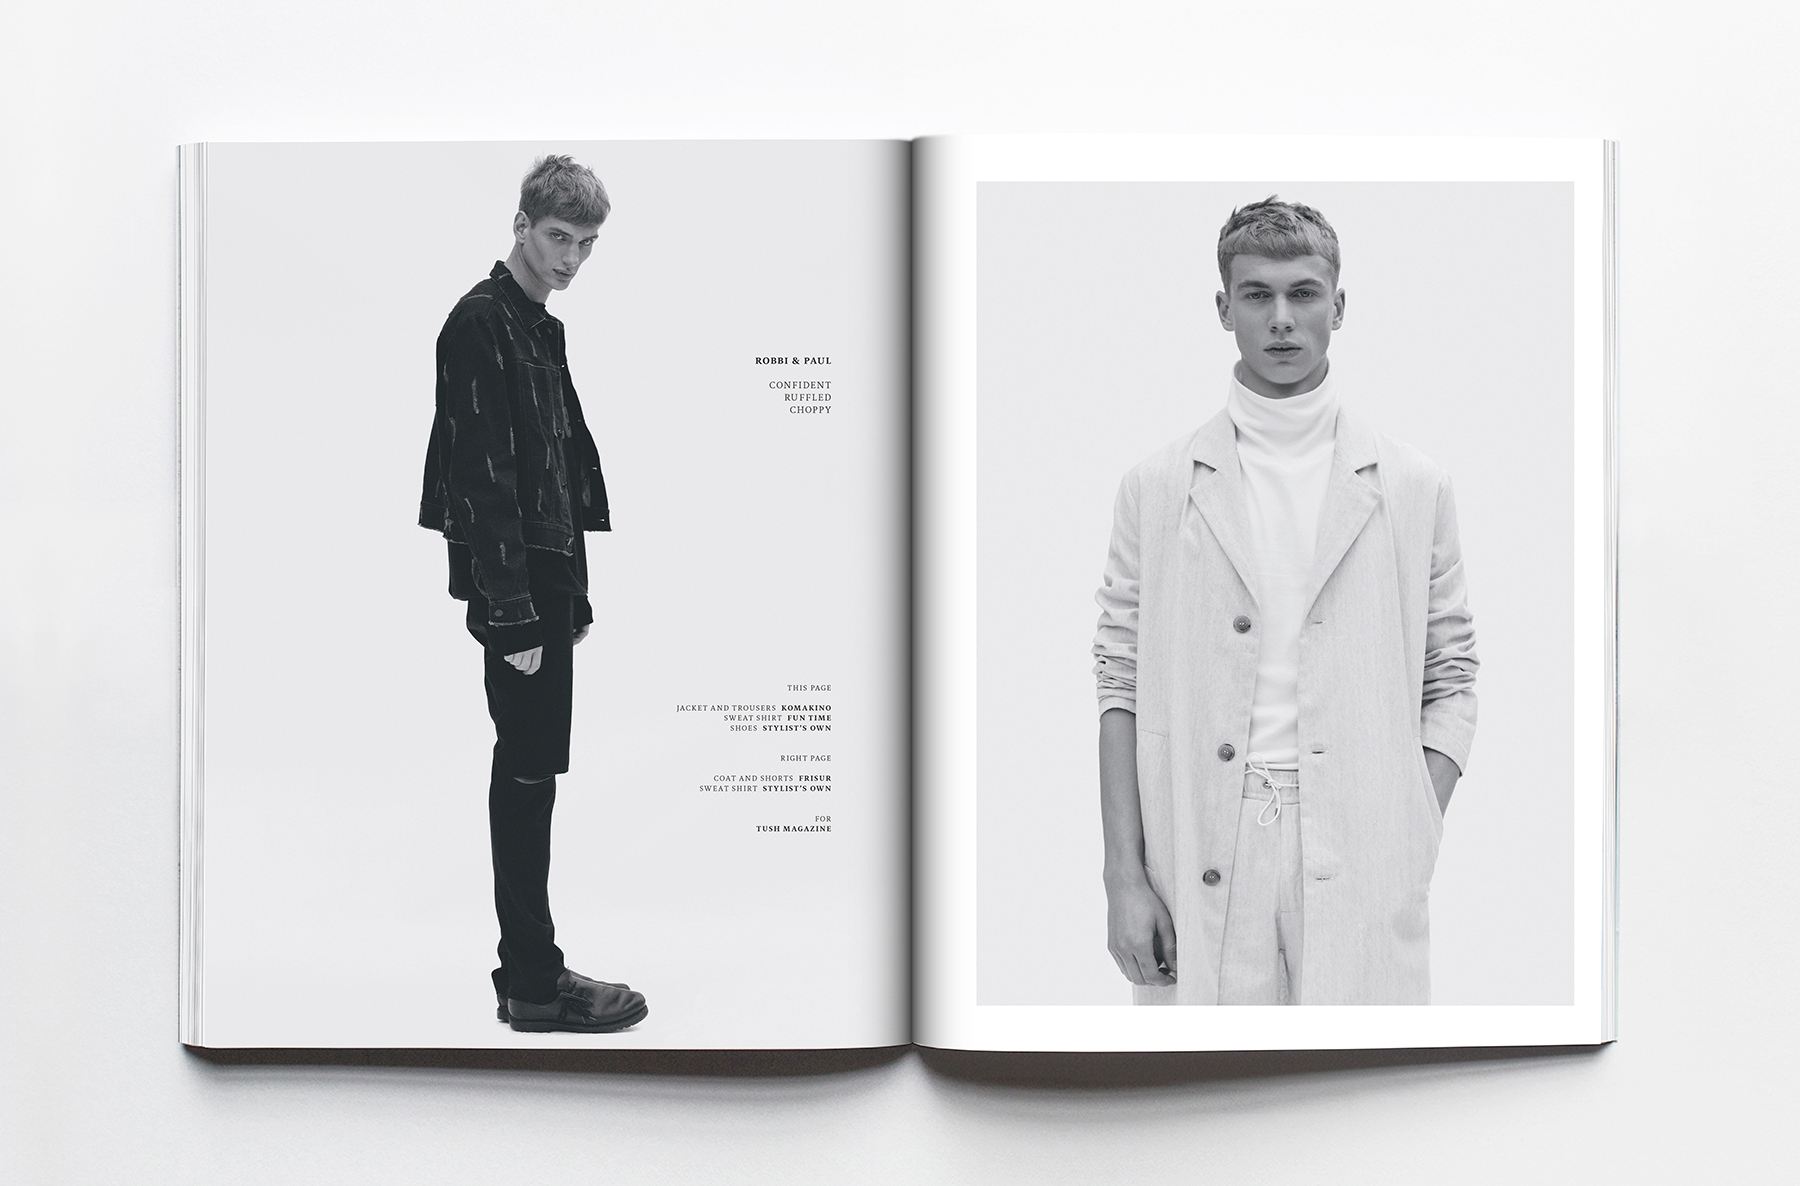 wla_magazine_33.jpg